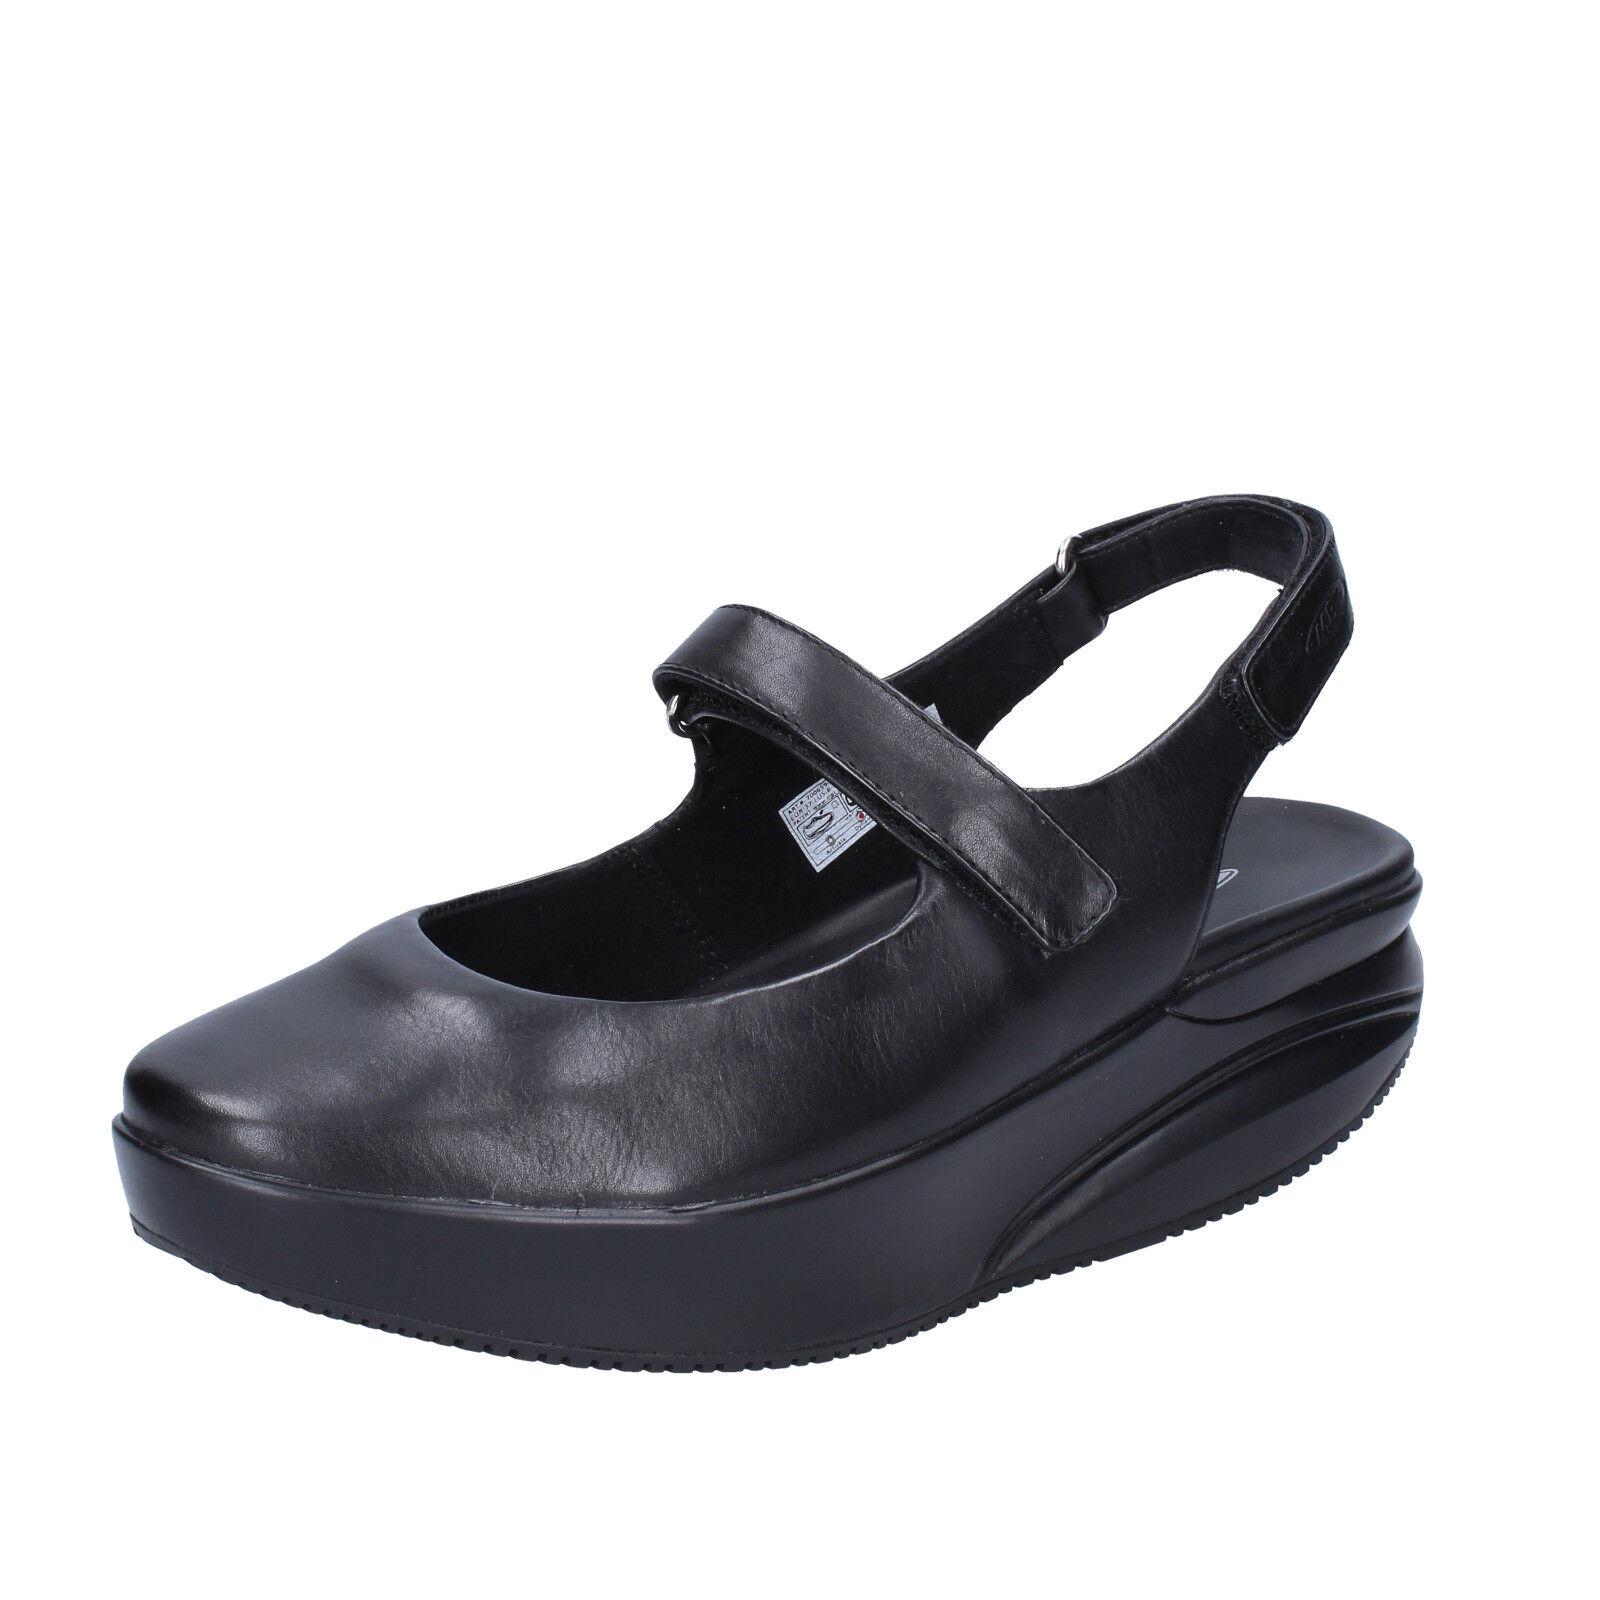 Scarpe donna MBT KOFFI 35 EU ballerine nero pelle dynamic BX889-35